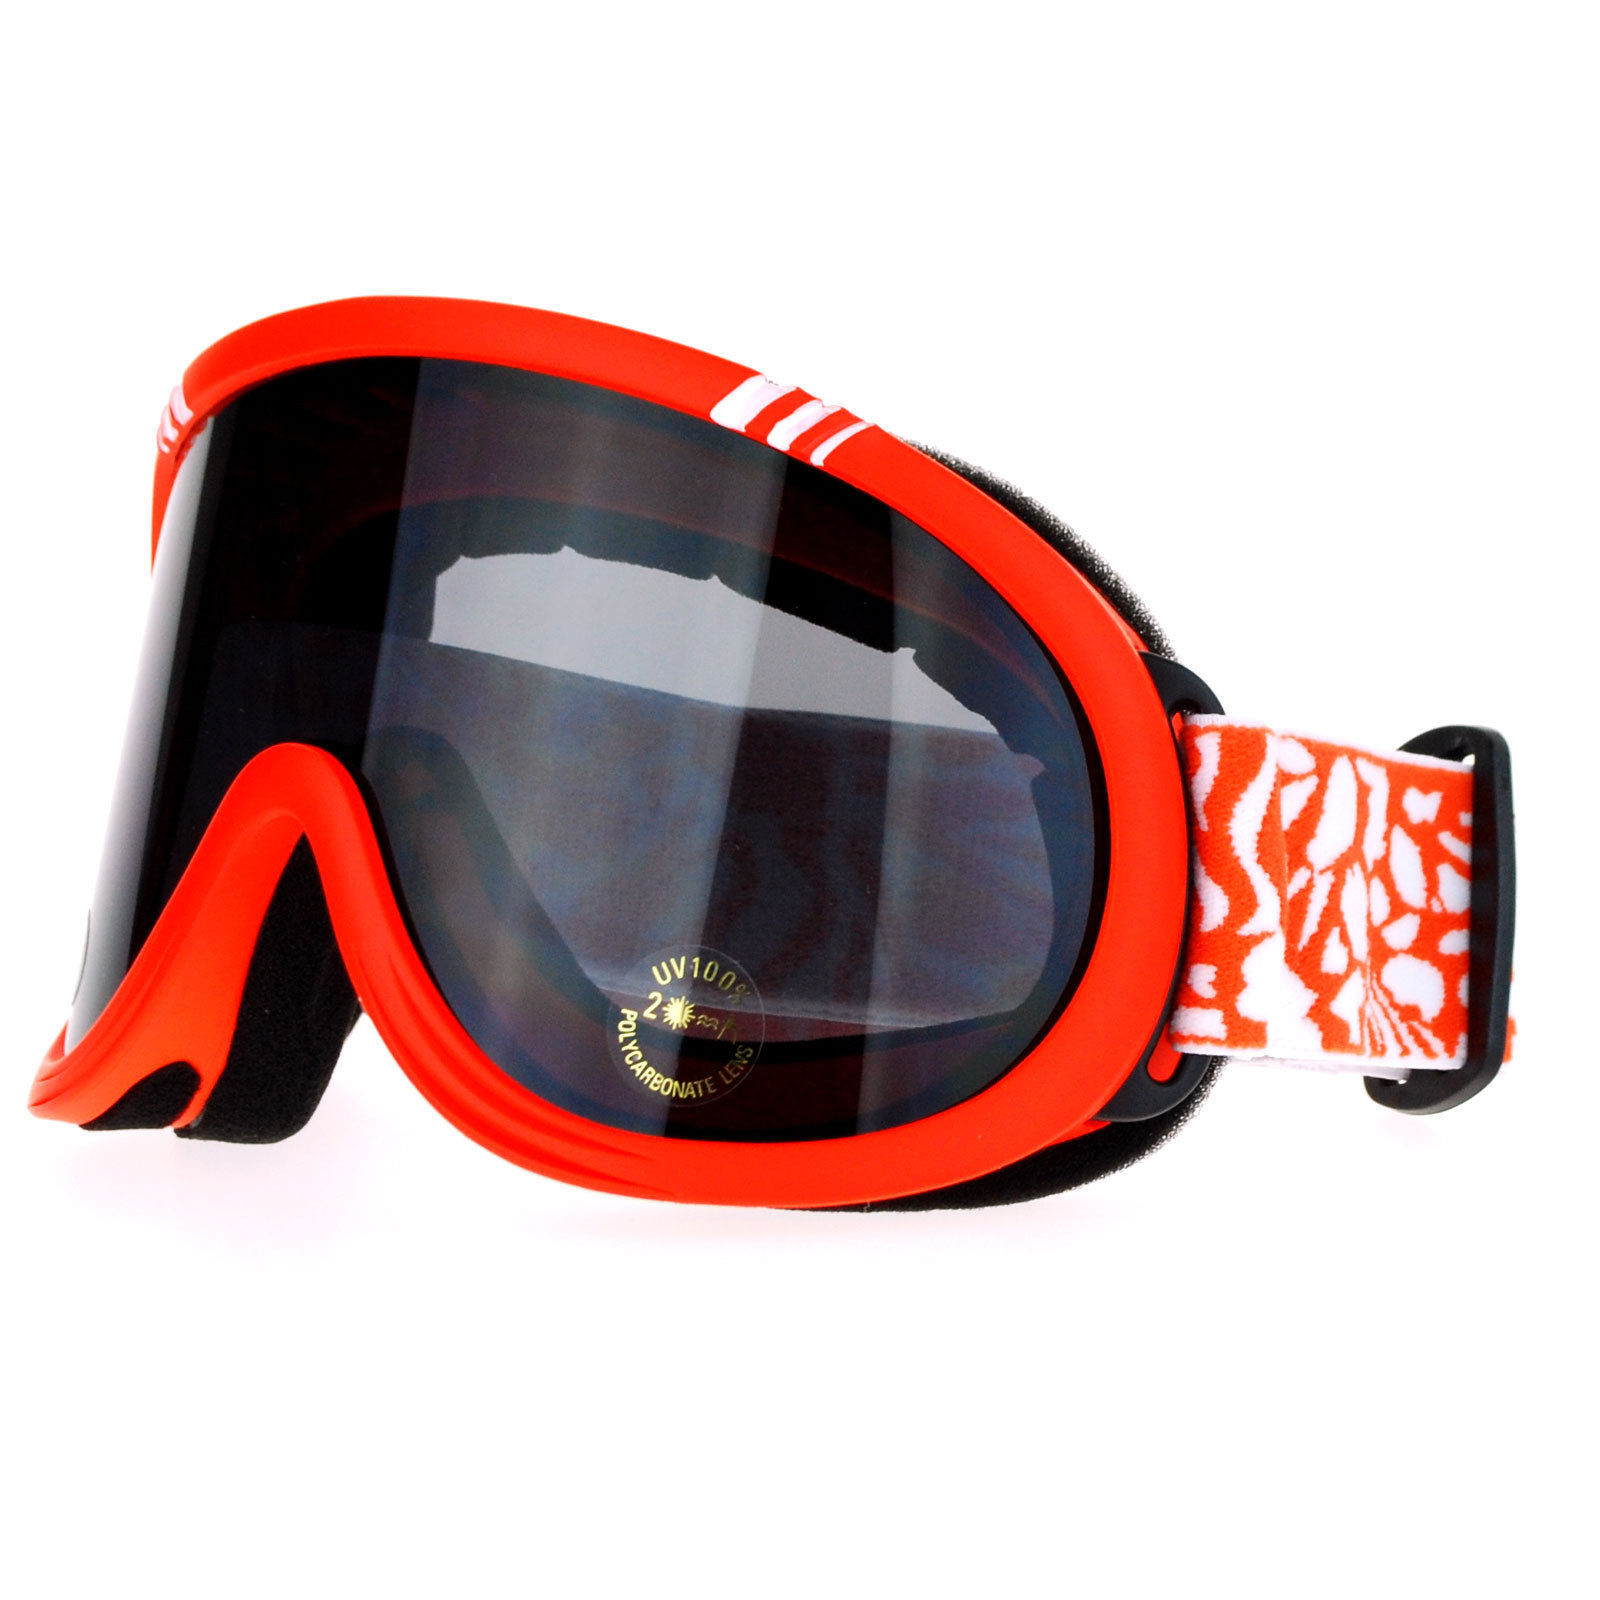 af0f8cfa81c9 Ski Snowboard Goggles Anti Fog Shatter Proof Lens Digital Pixel Print